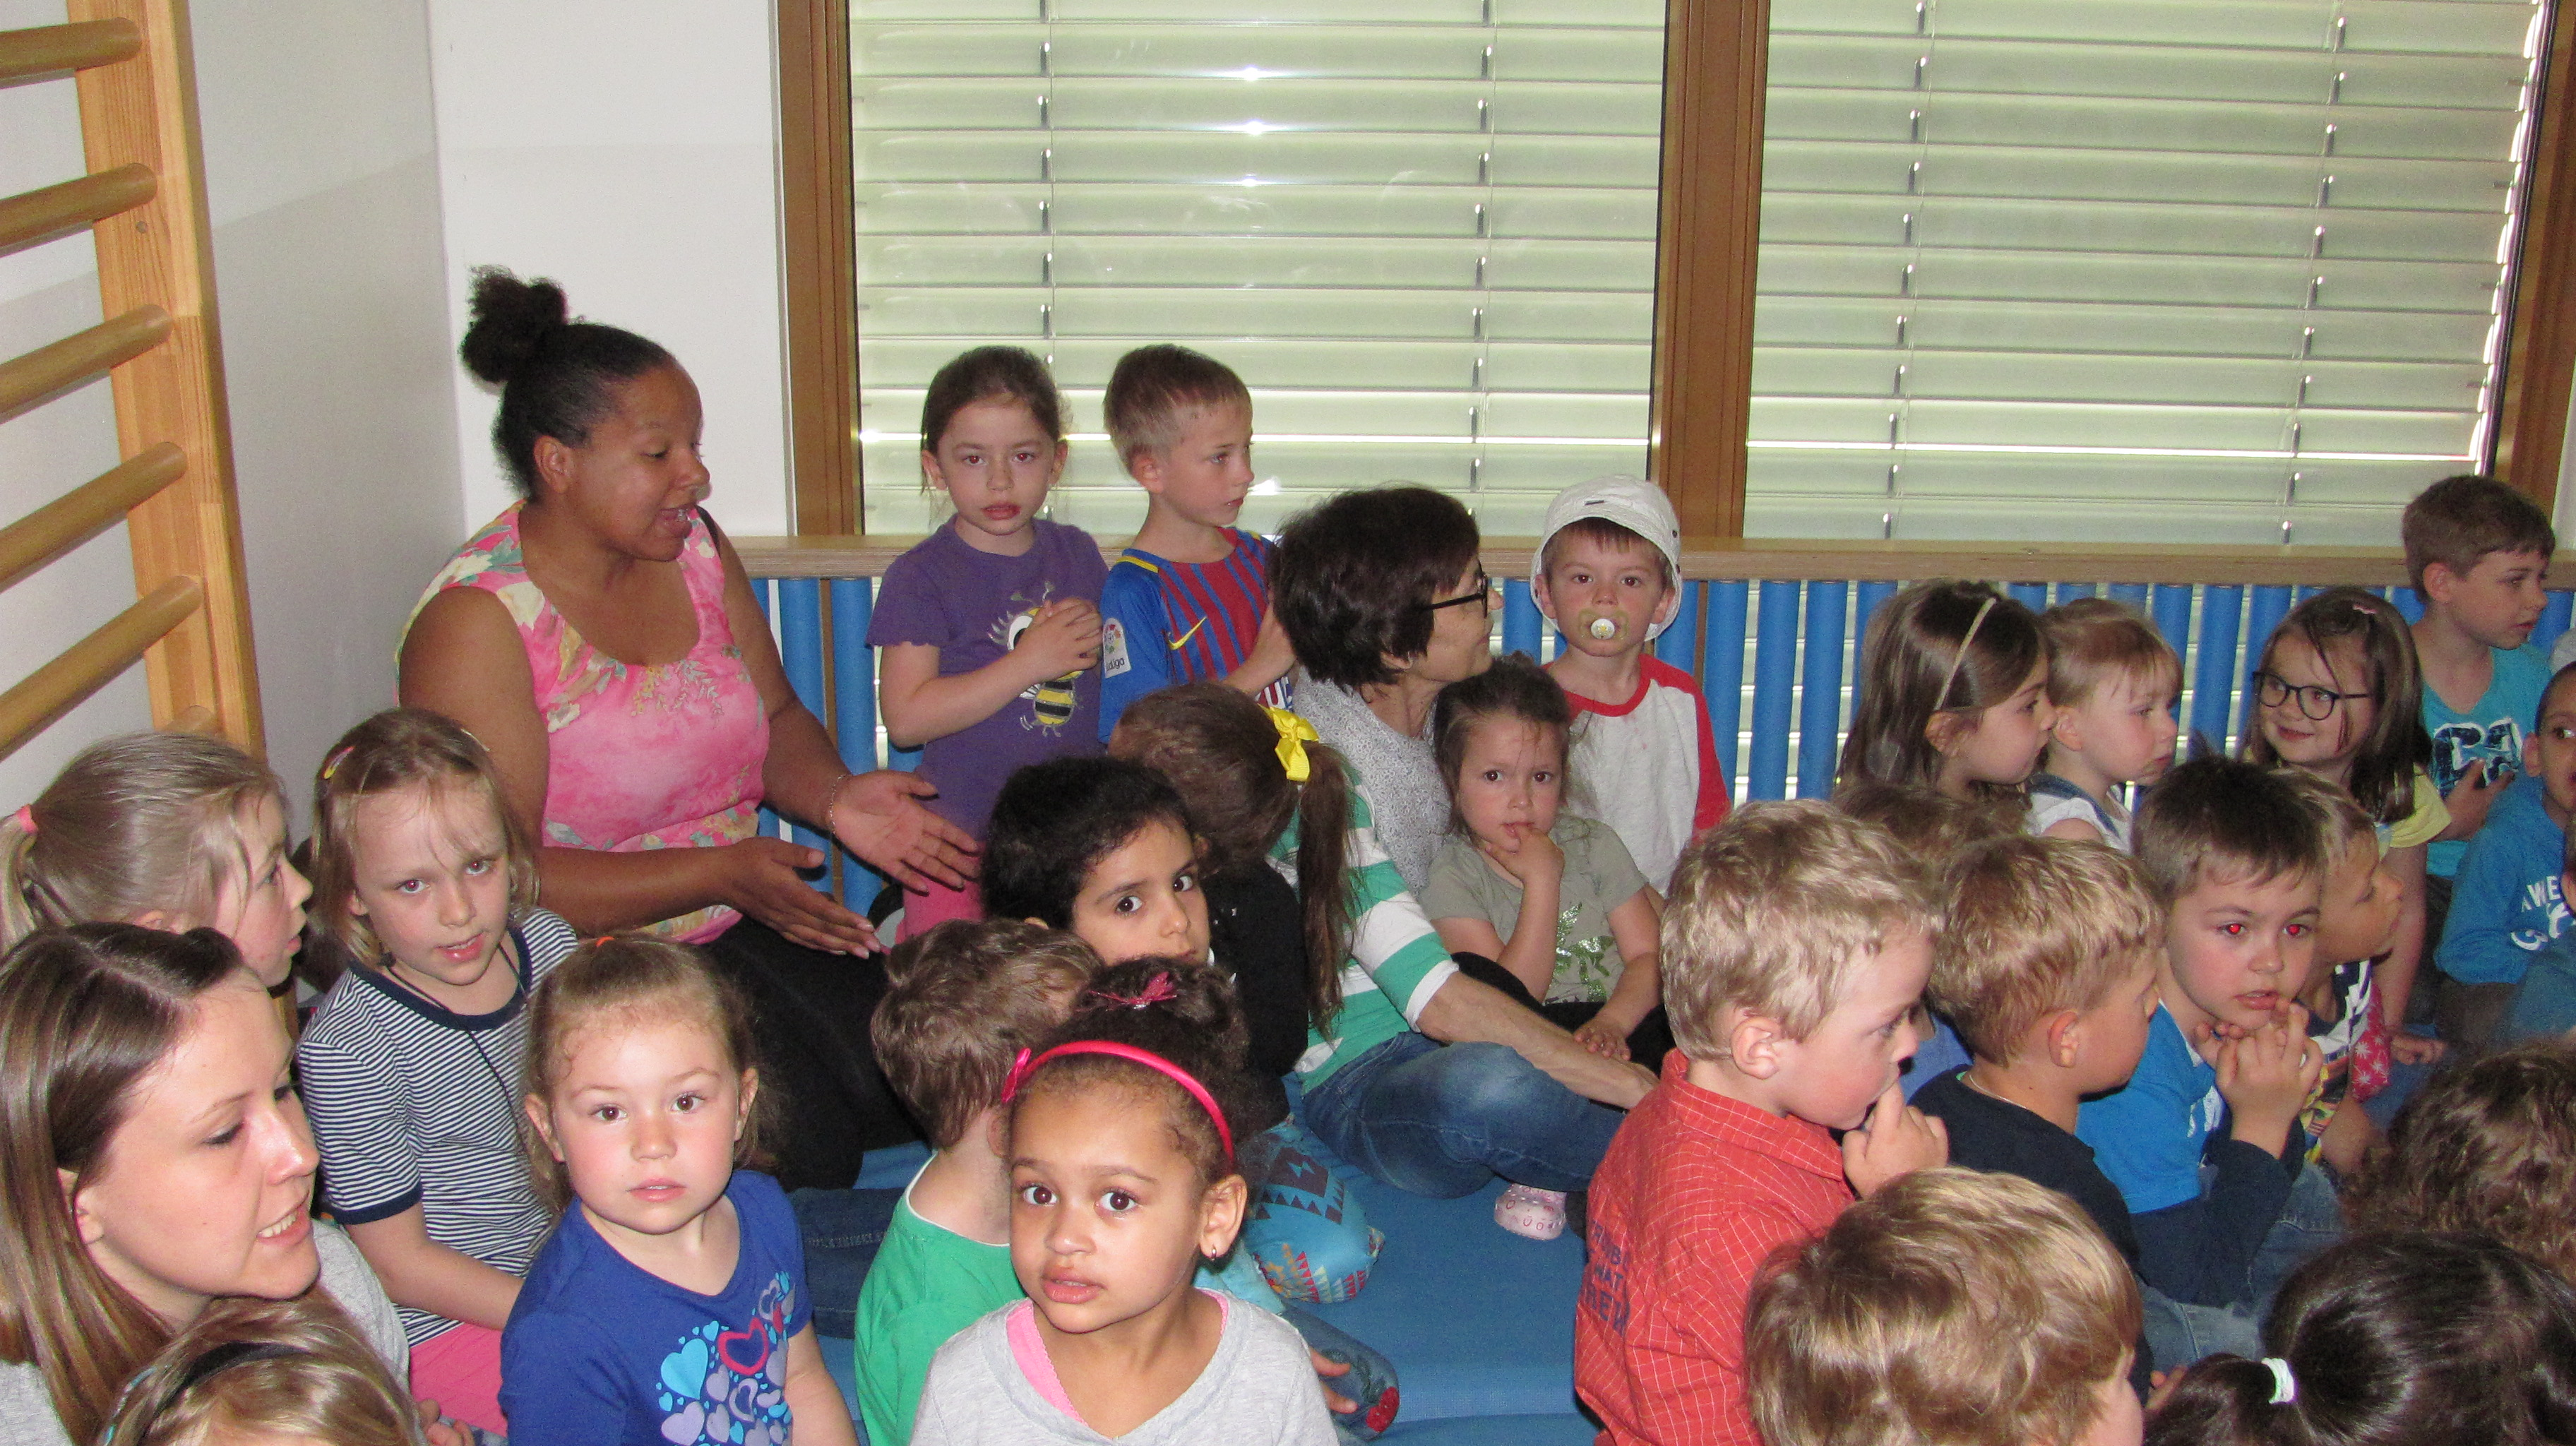 Kinderhausleiterin Doris Weigl 49 +1